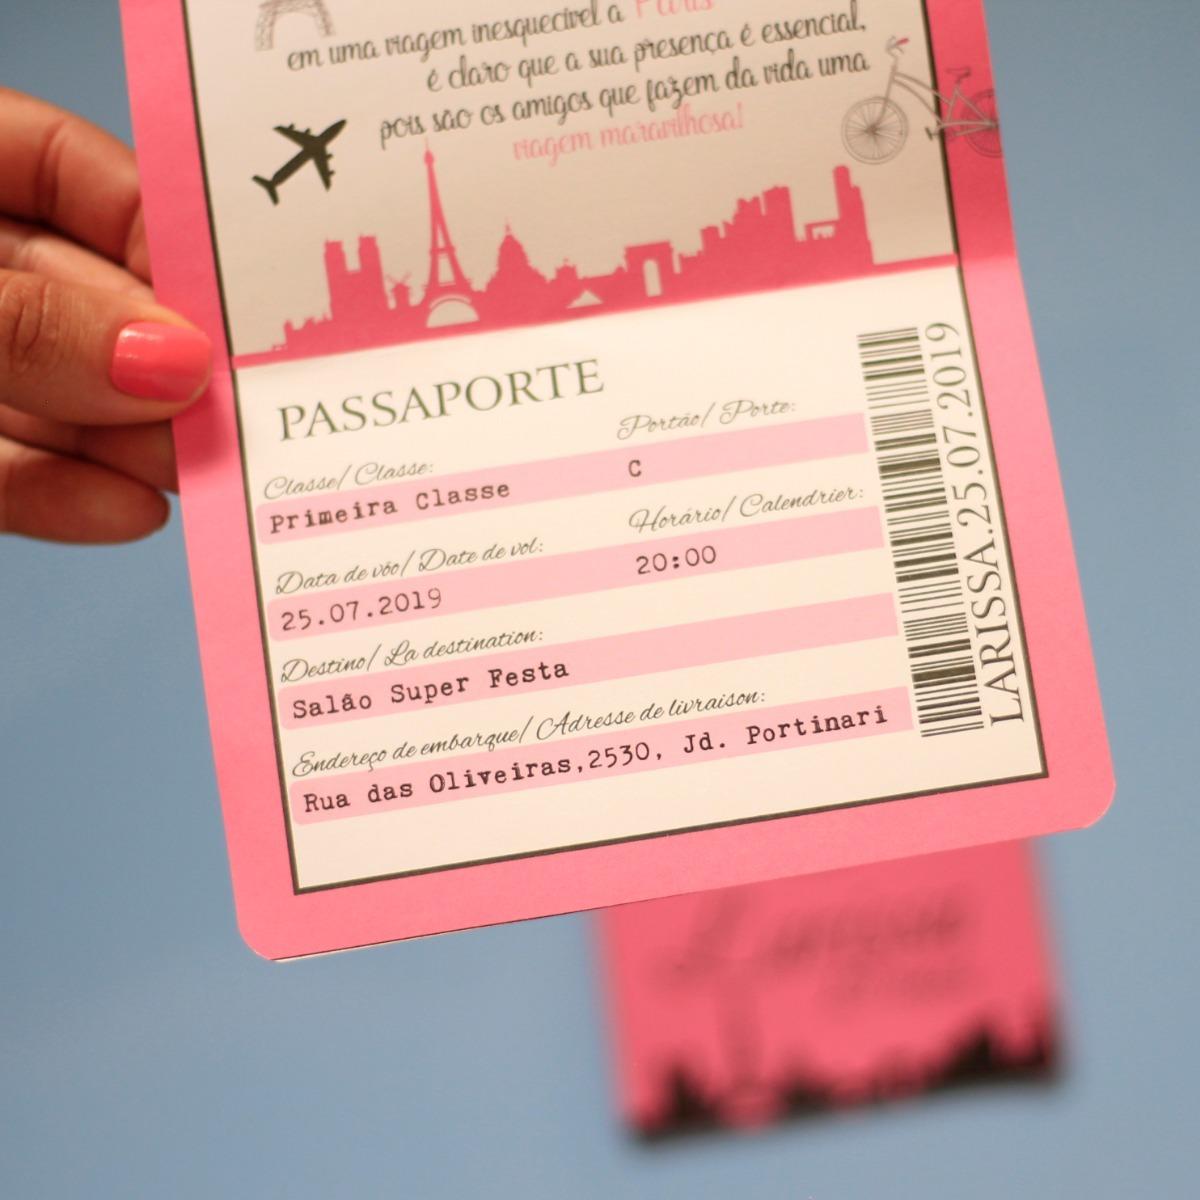 70 Convite Criativo 15 Anos Passaporte Paris Rosa Preto R 119